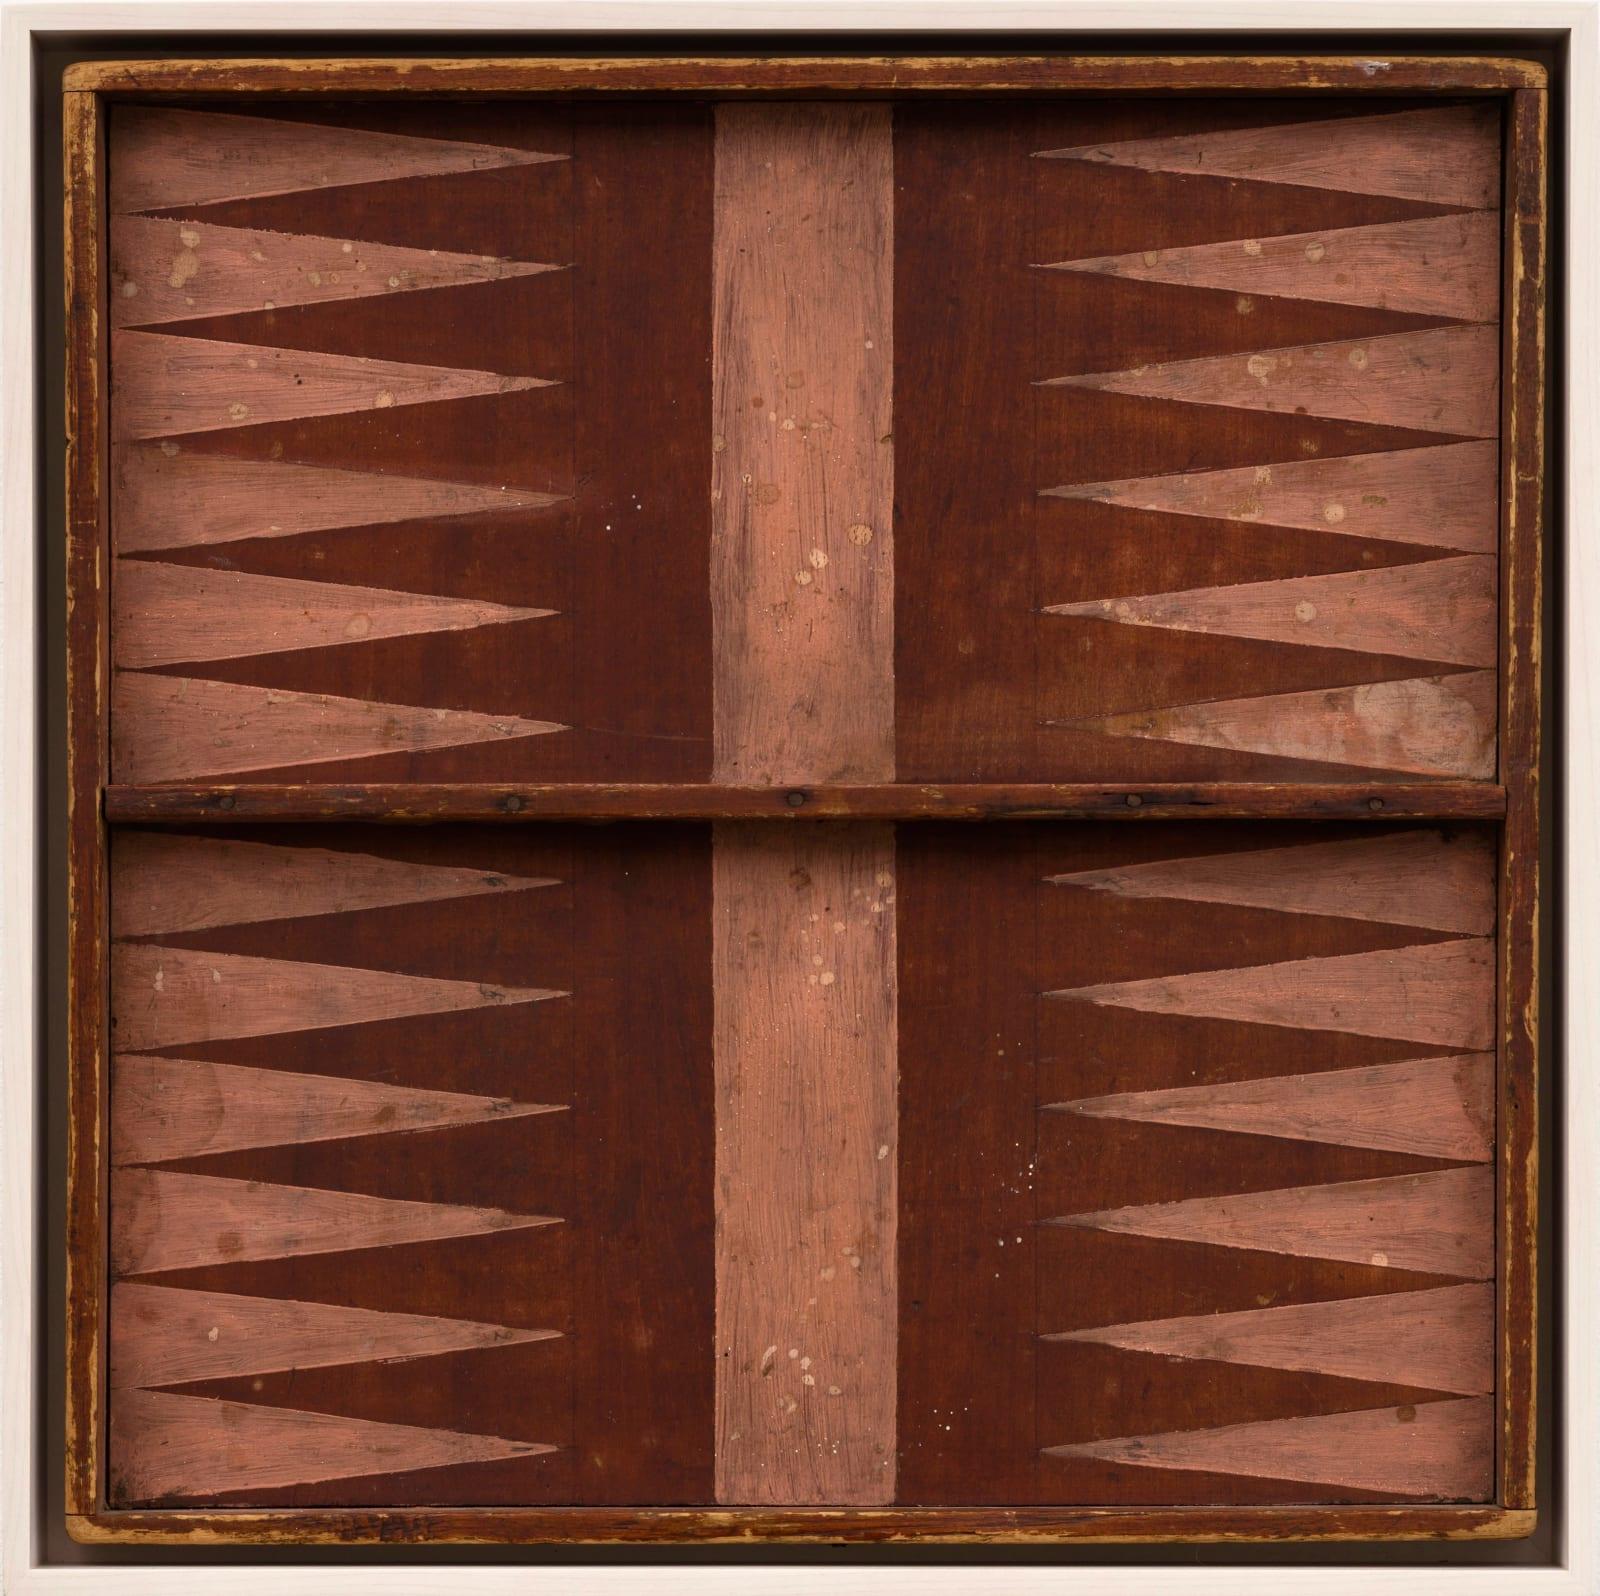 BACKGAMMON GAME BOARD, EARLY 20TH CENTURY Oil enamel on wood panel 18 x 18 in. 45.7 x 45.7 cm. (AU 260)